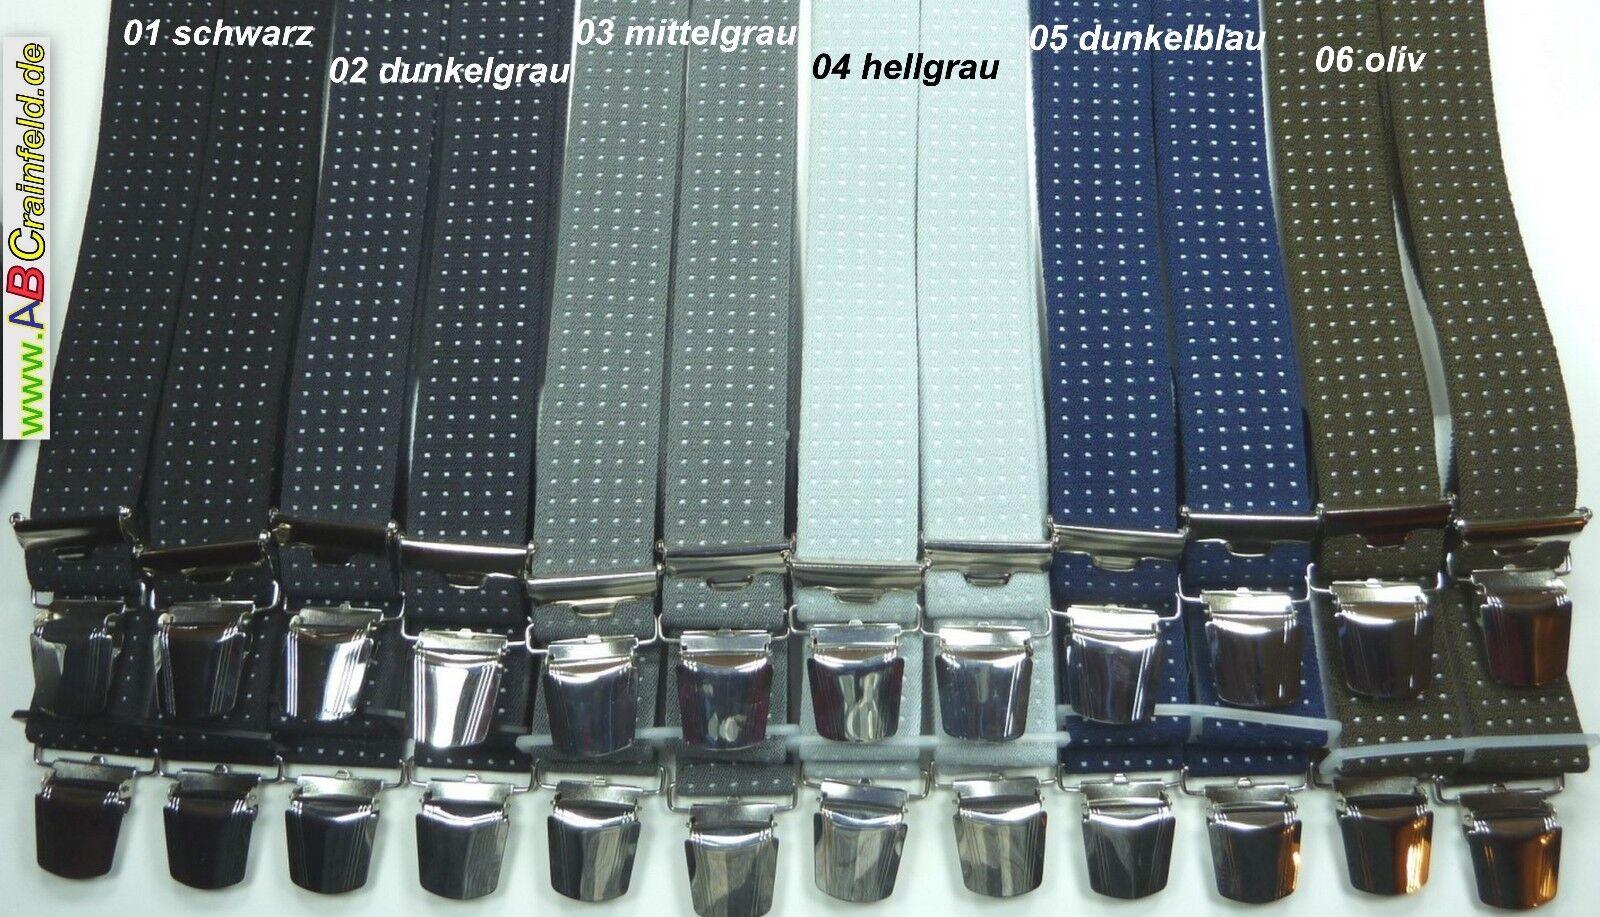 Hosenträger, 4 breite extra starke ABC-Clips, 35 mm breit, 70 cm-200 cm lang